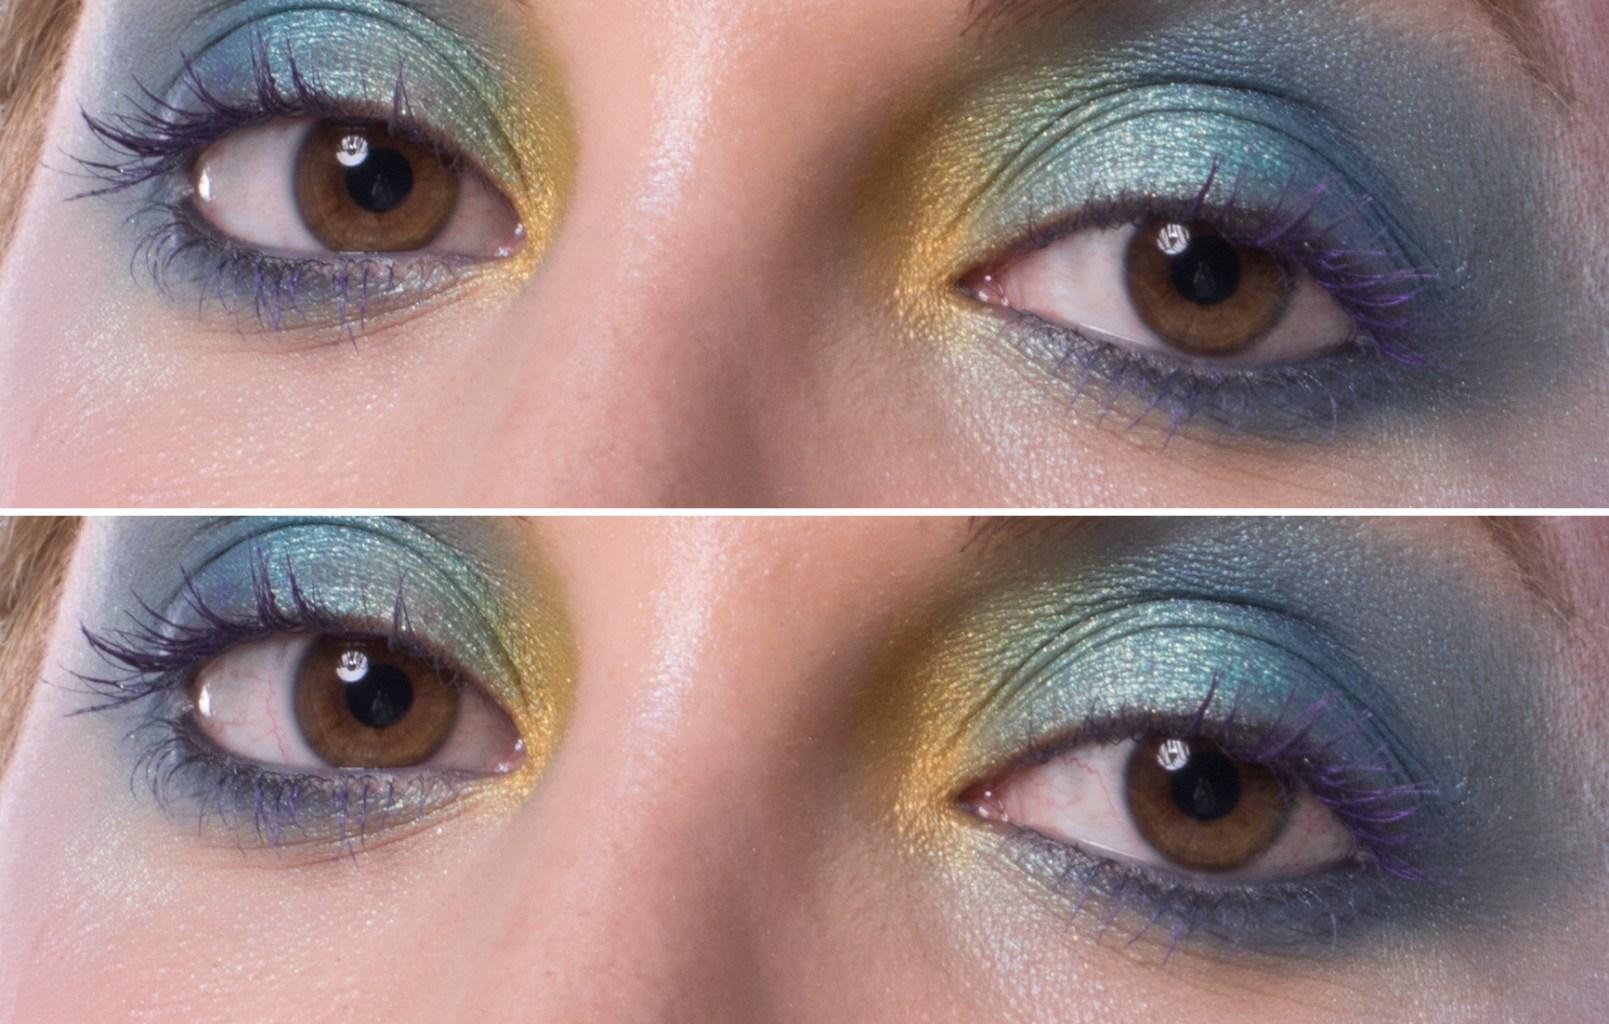 iris-encina-limpiar-ojos-photoshop